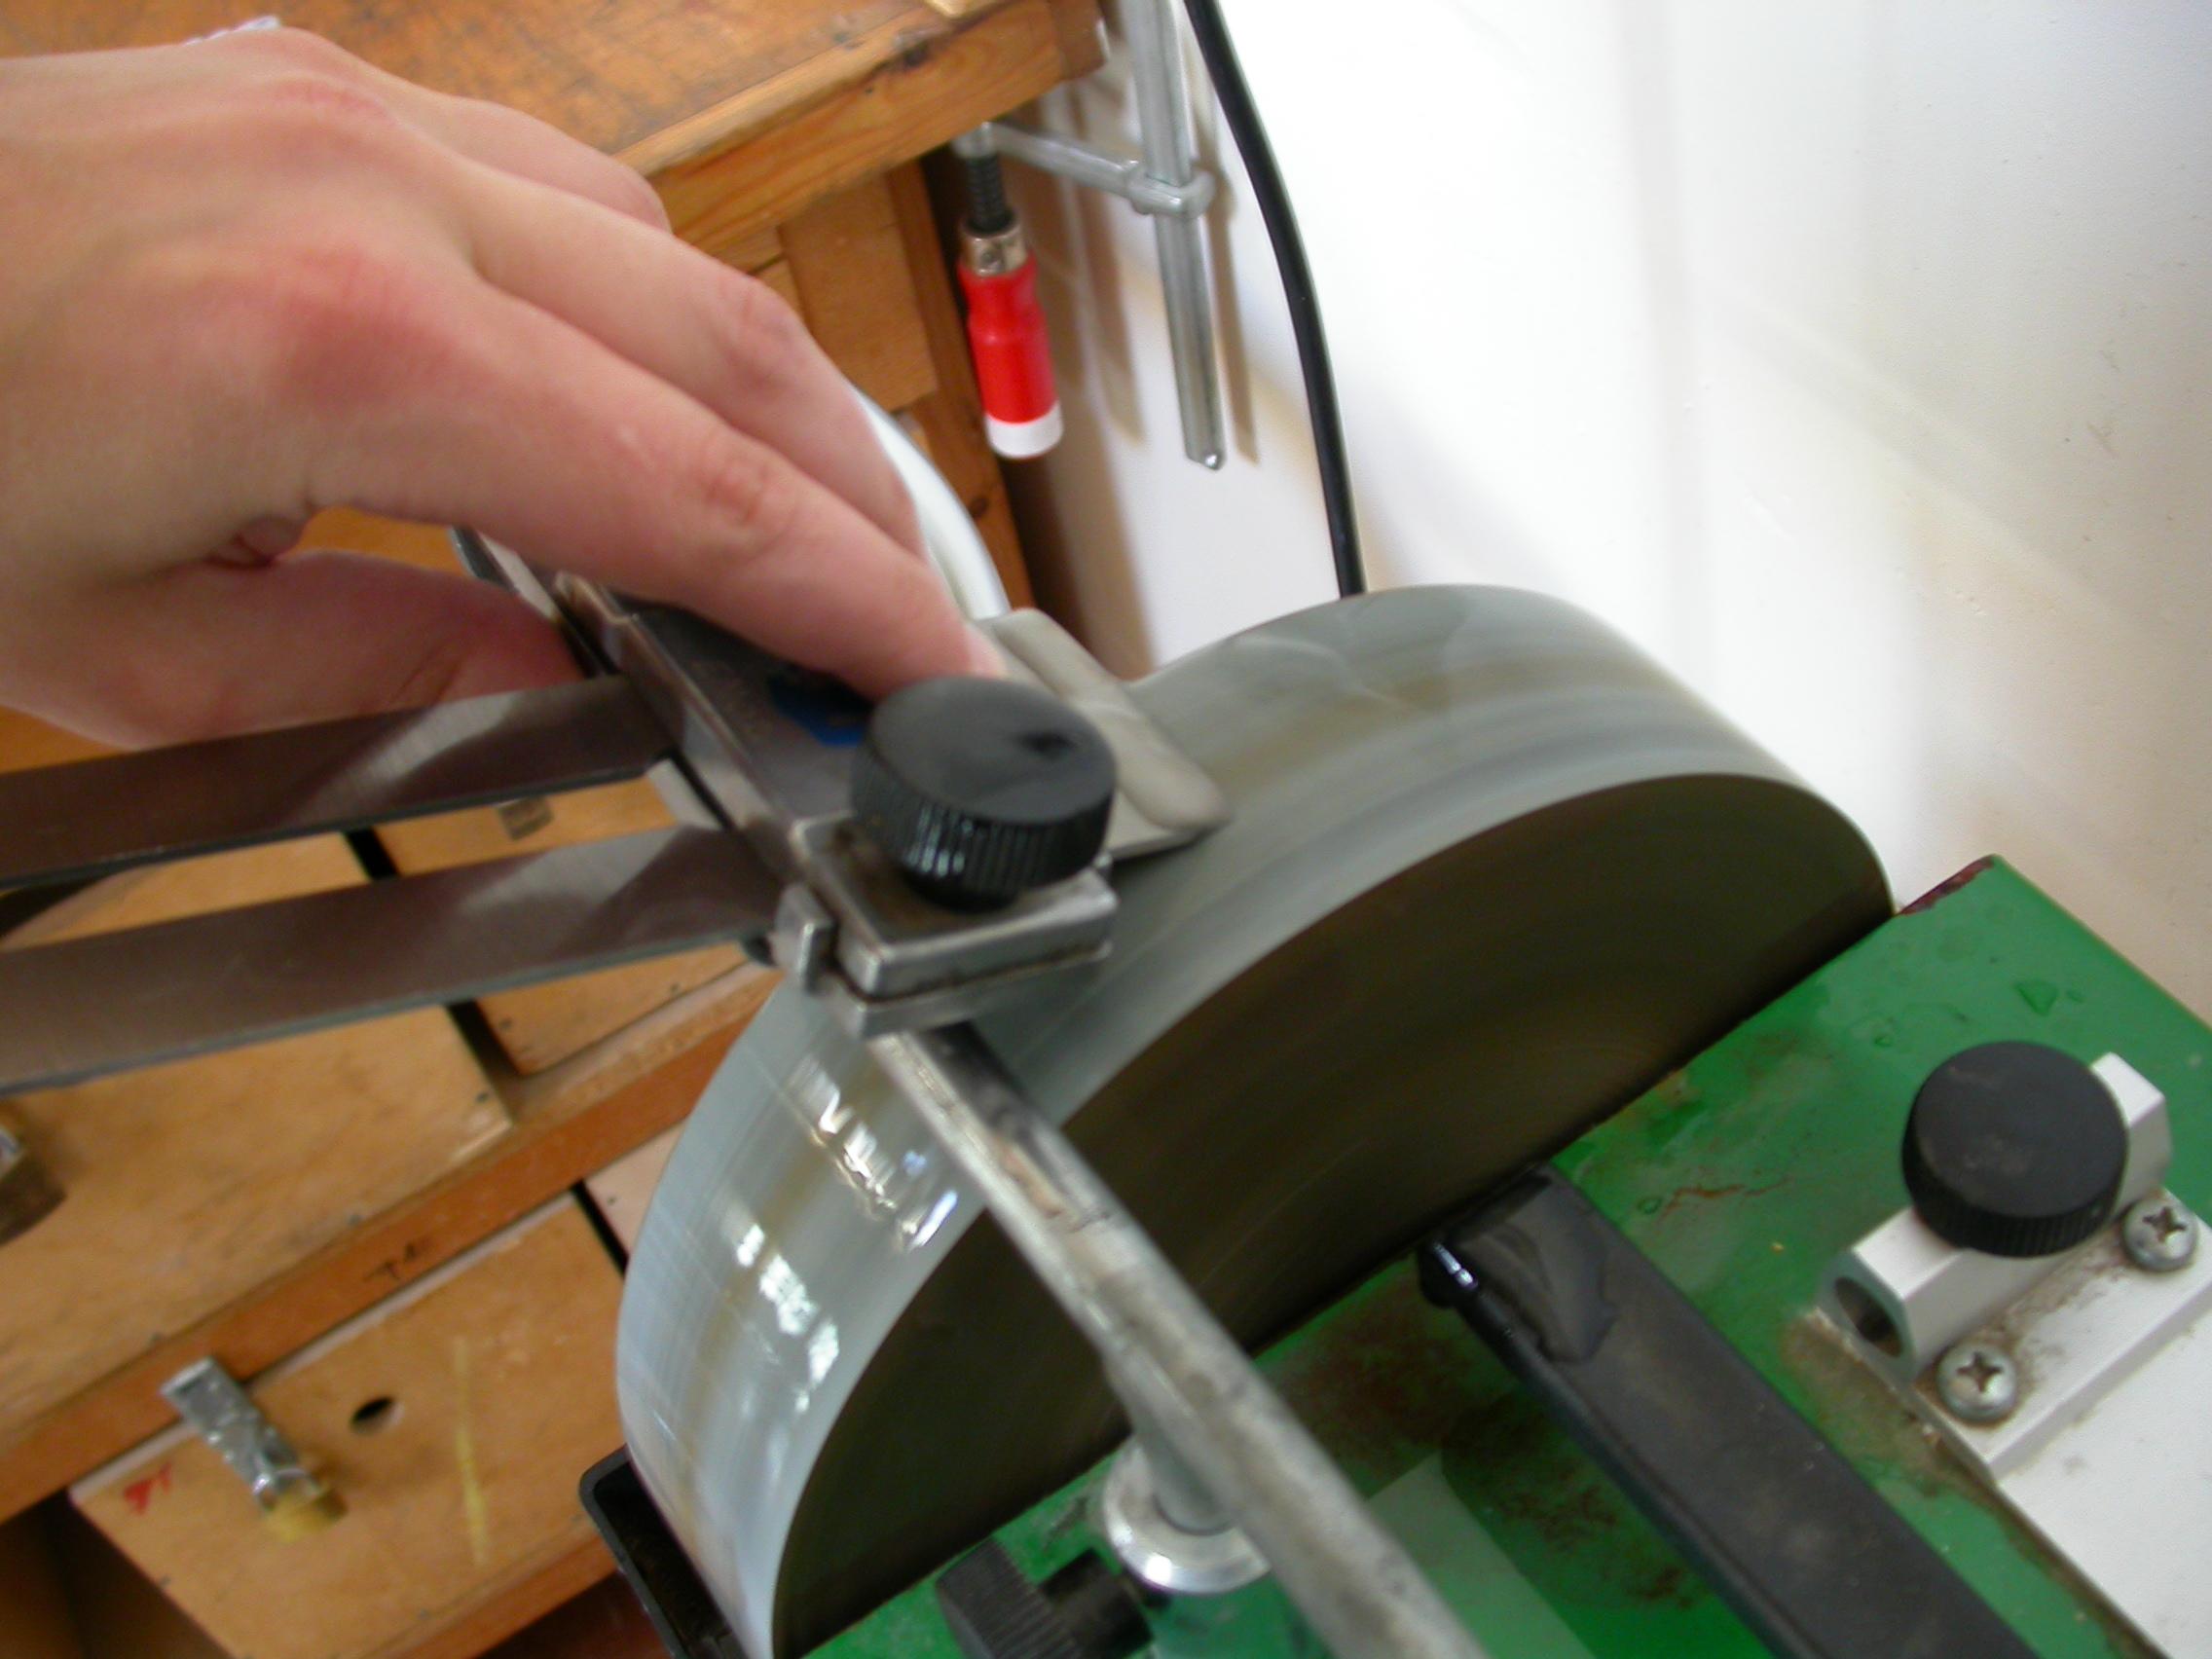 paul sharpening scour sharpen filing polishing tools handiwork